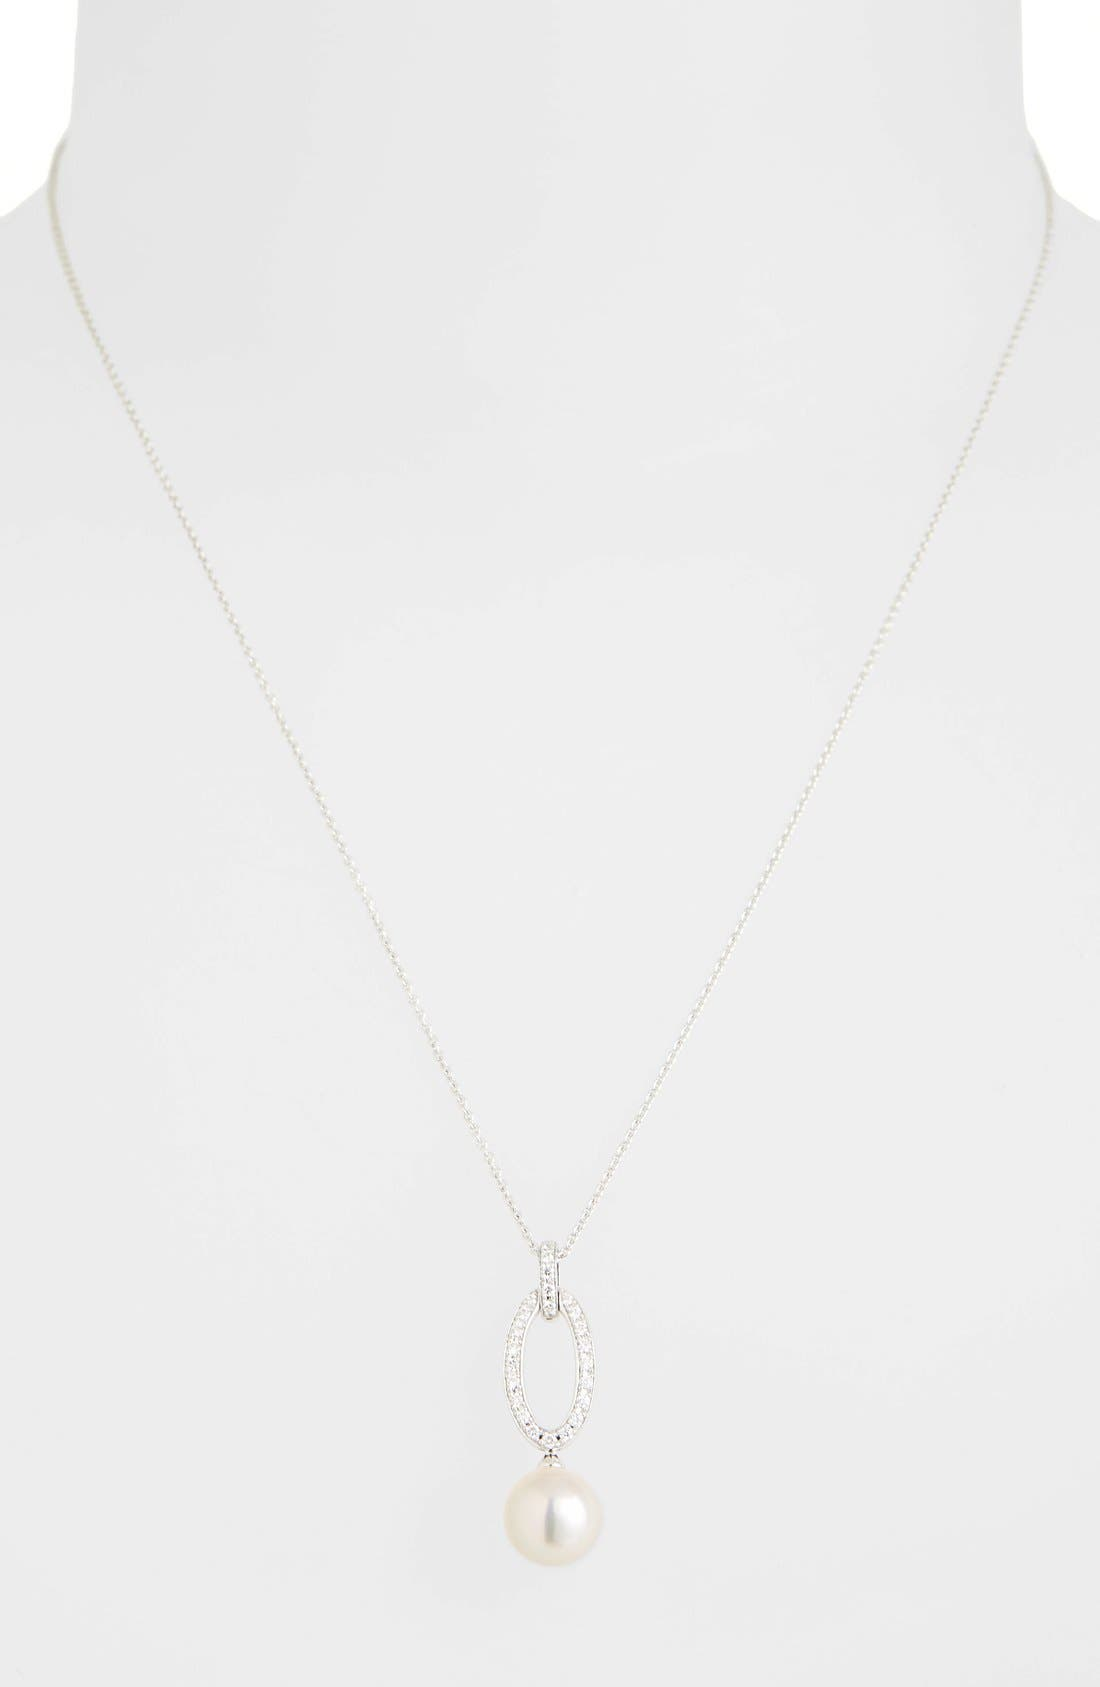 Diamond & Akoya Cultured Pearl Pendant Necklace,                         Main,                         color, WHITE GOLD